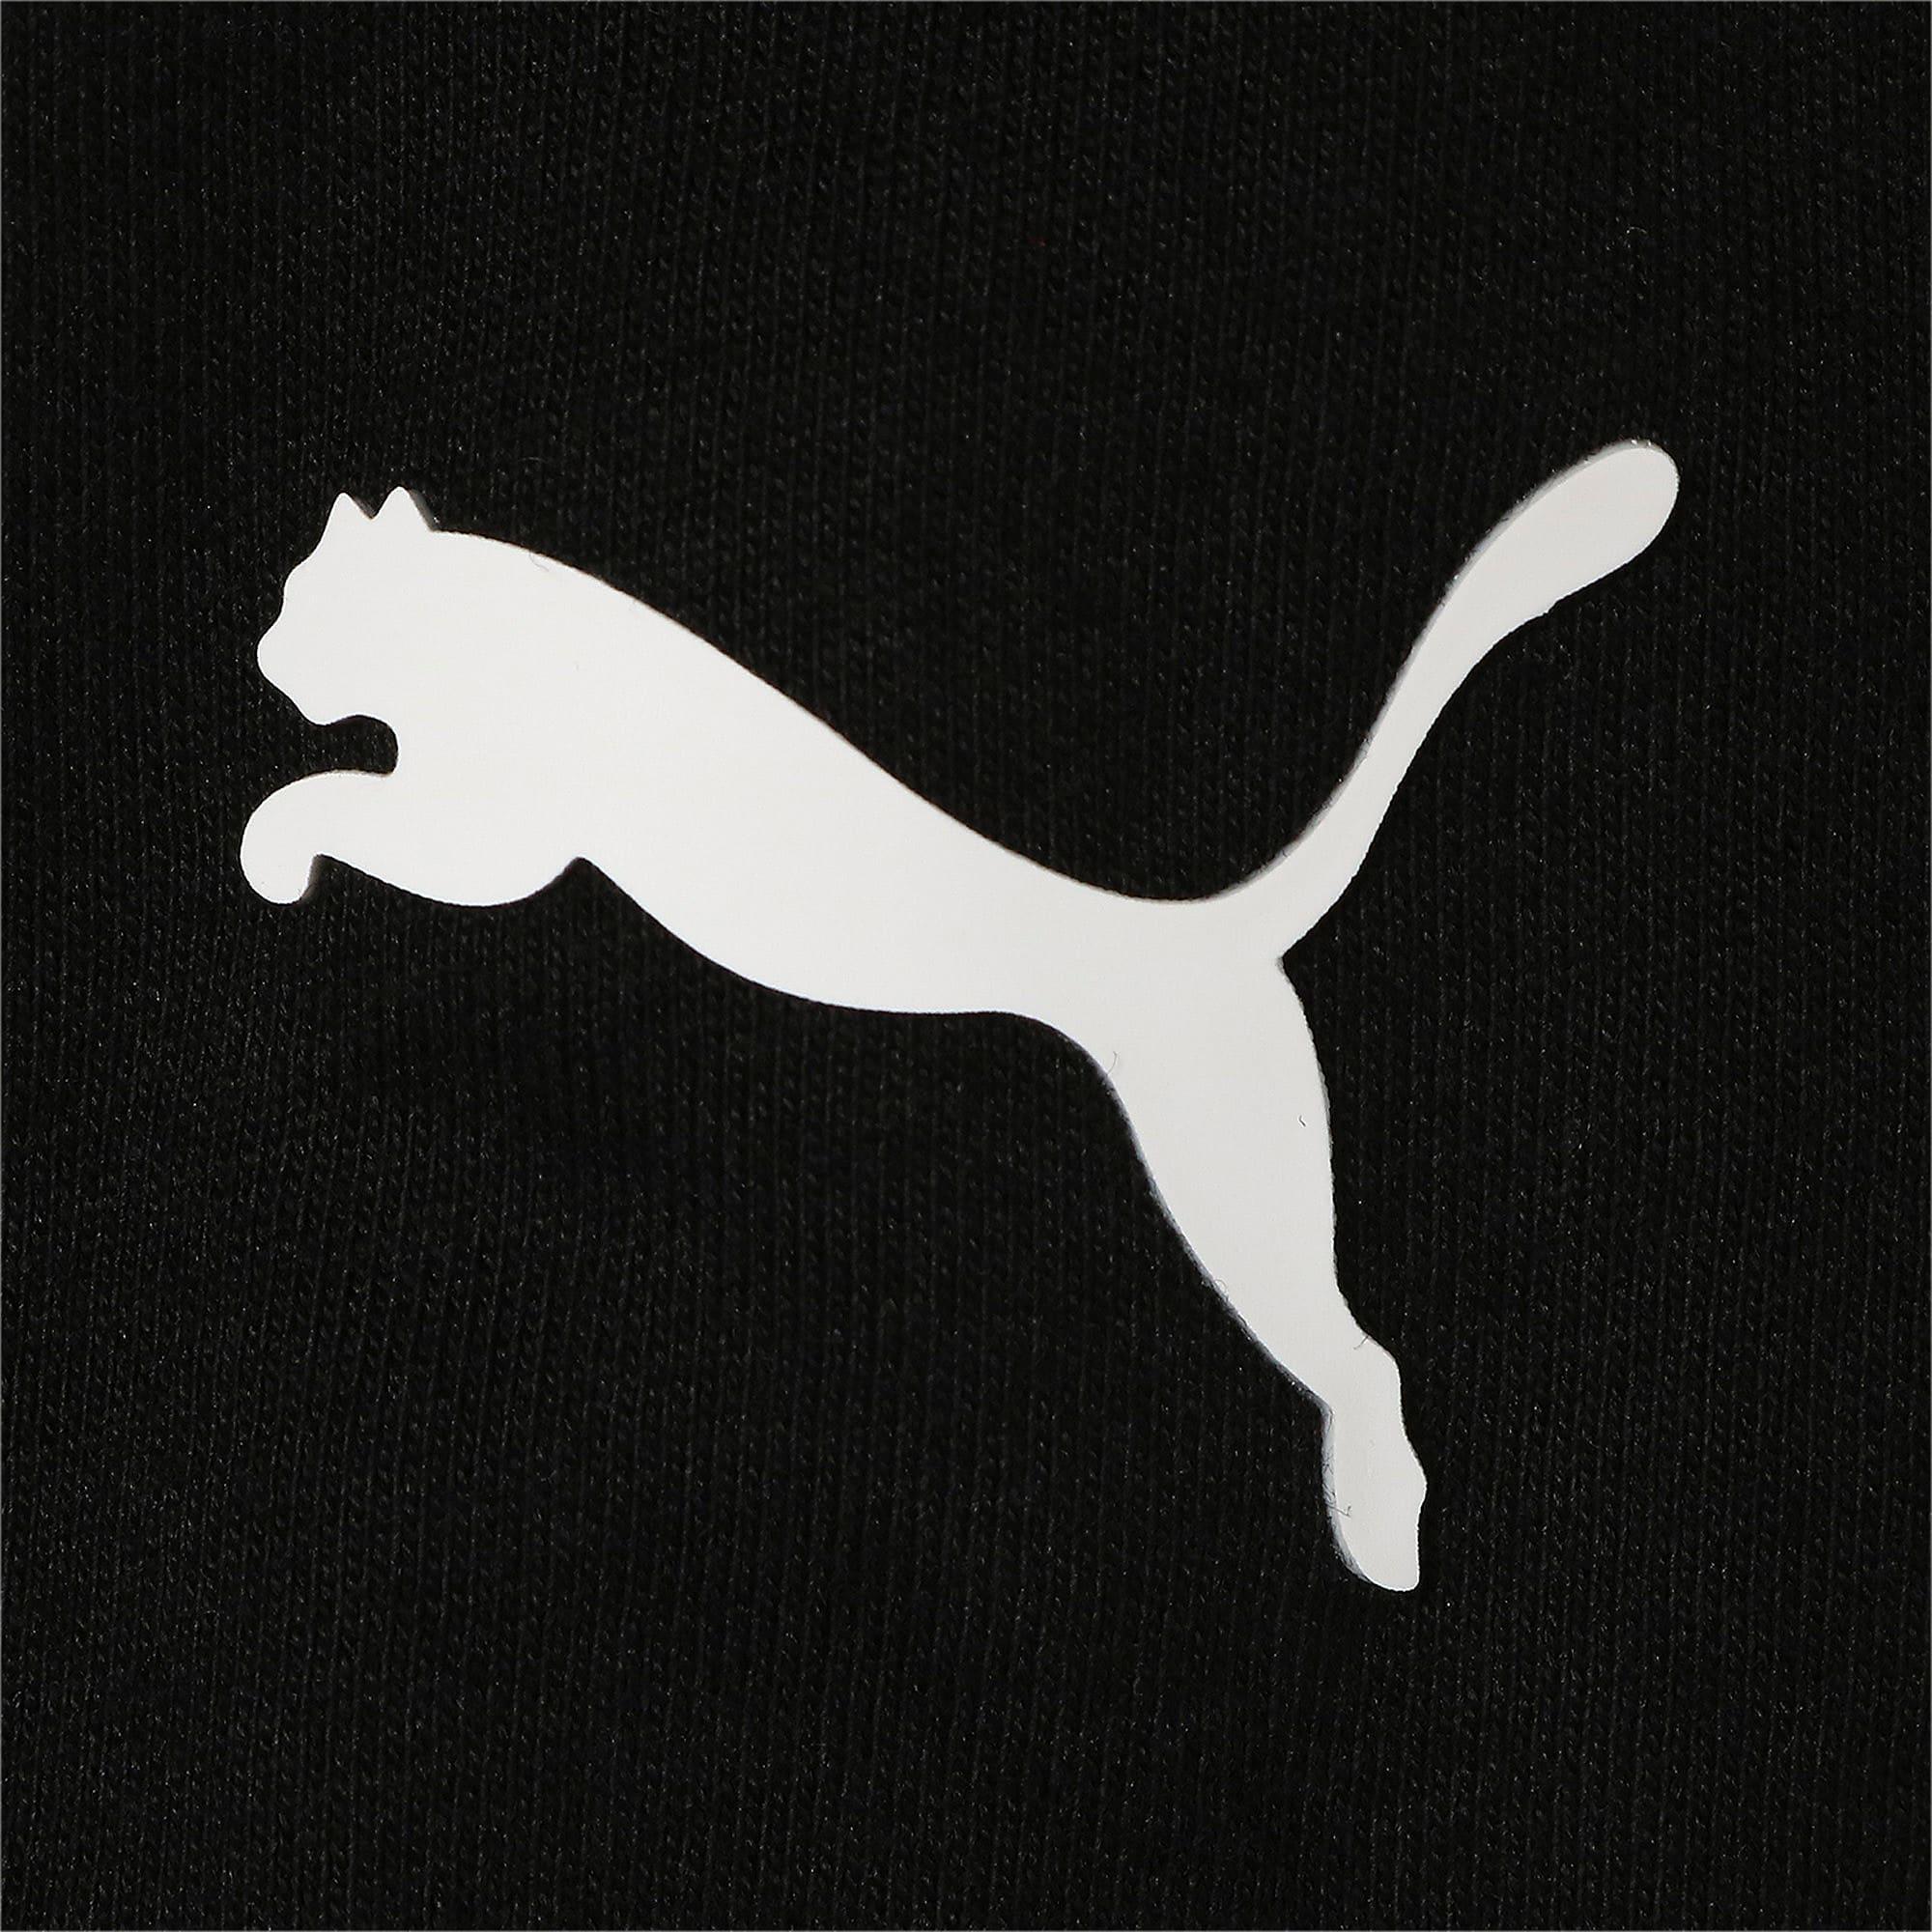 Thumbnail 4 of フェラーリ ビッグシールド Tシャツ + 半袖, Puma Black, medium-JPN